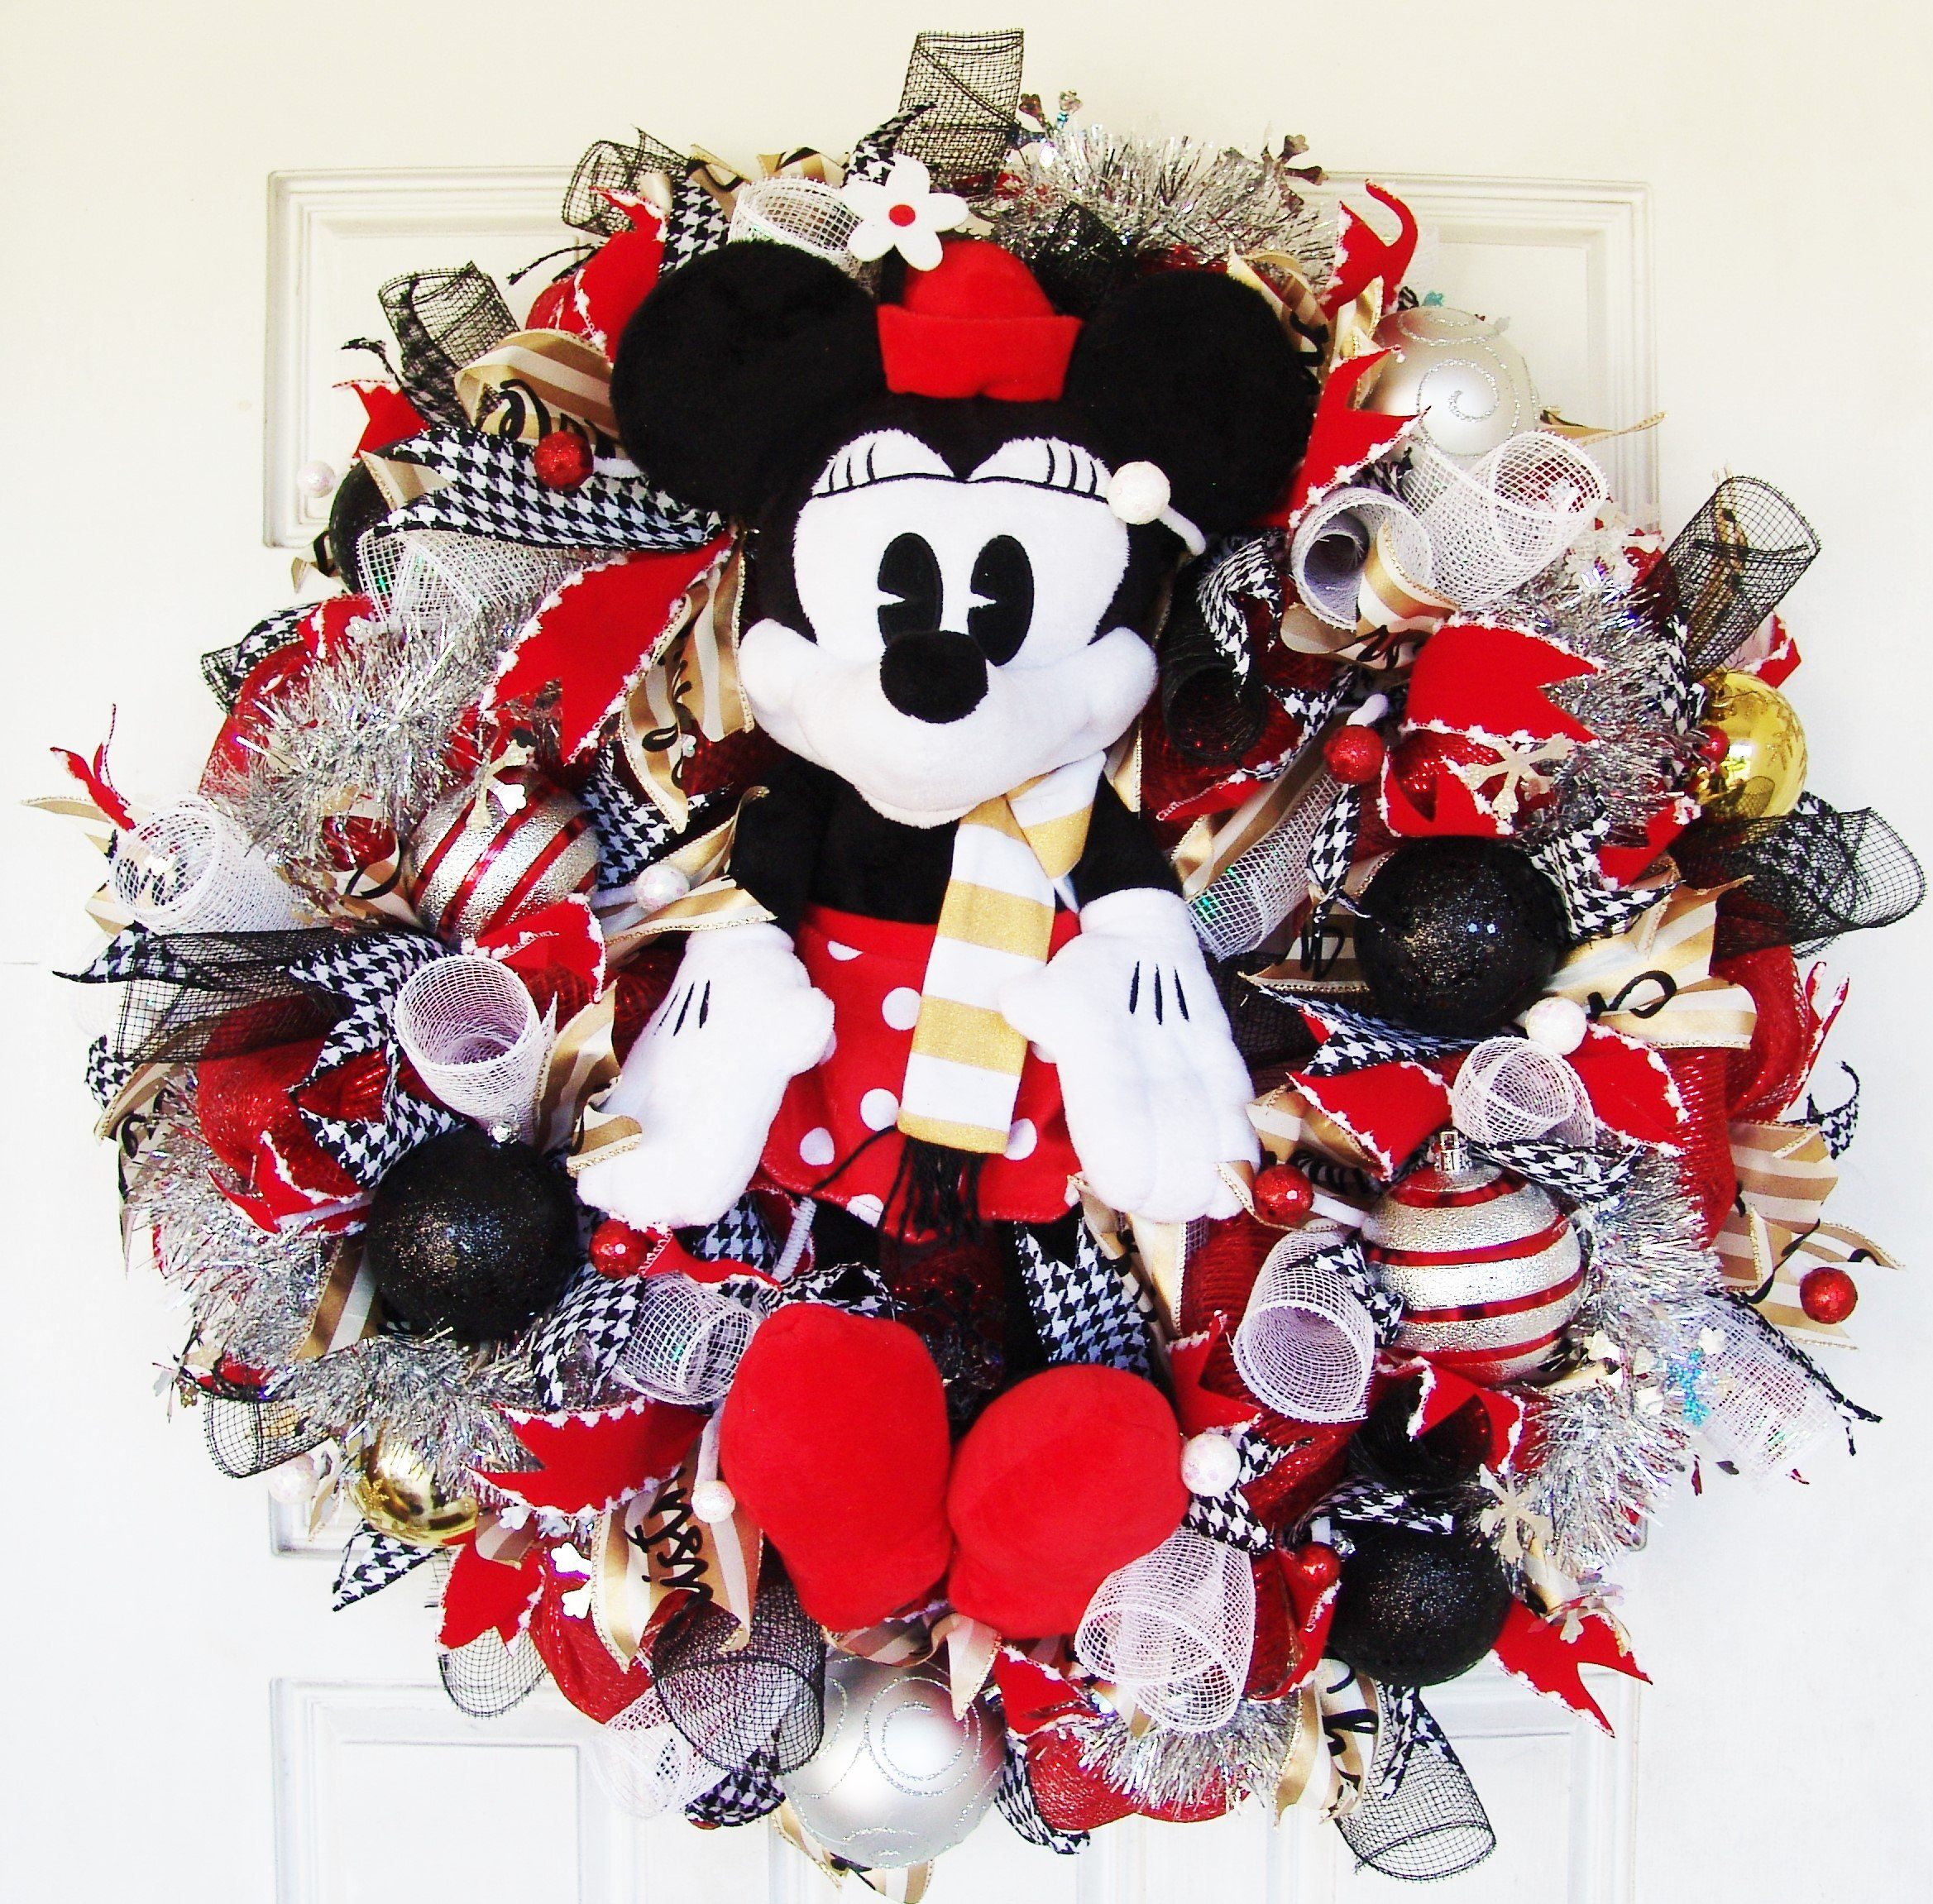 "XL Deluxe 28"" Vintage Minnie Mouse Disney Plush Christmas Deco Mesh"